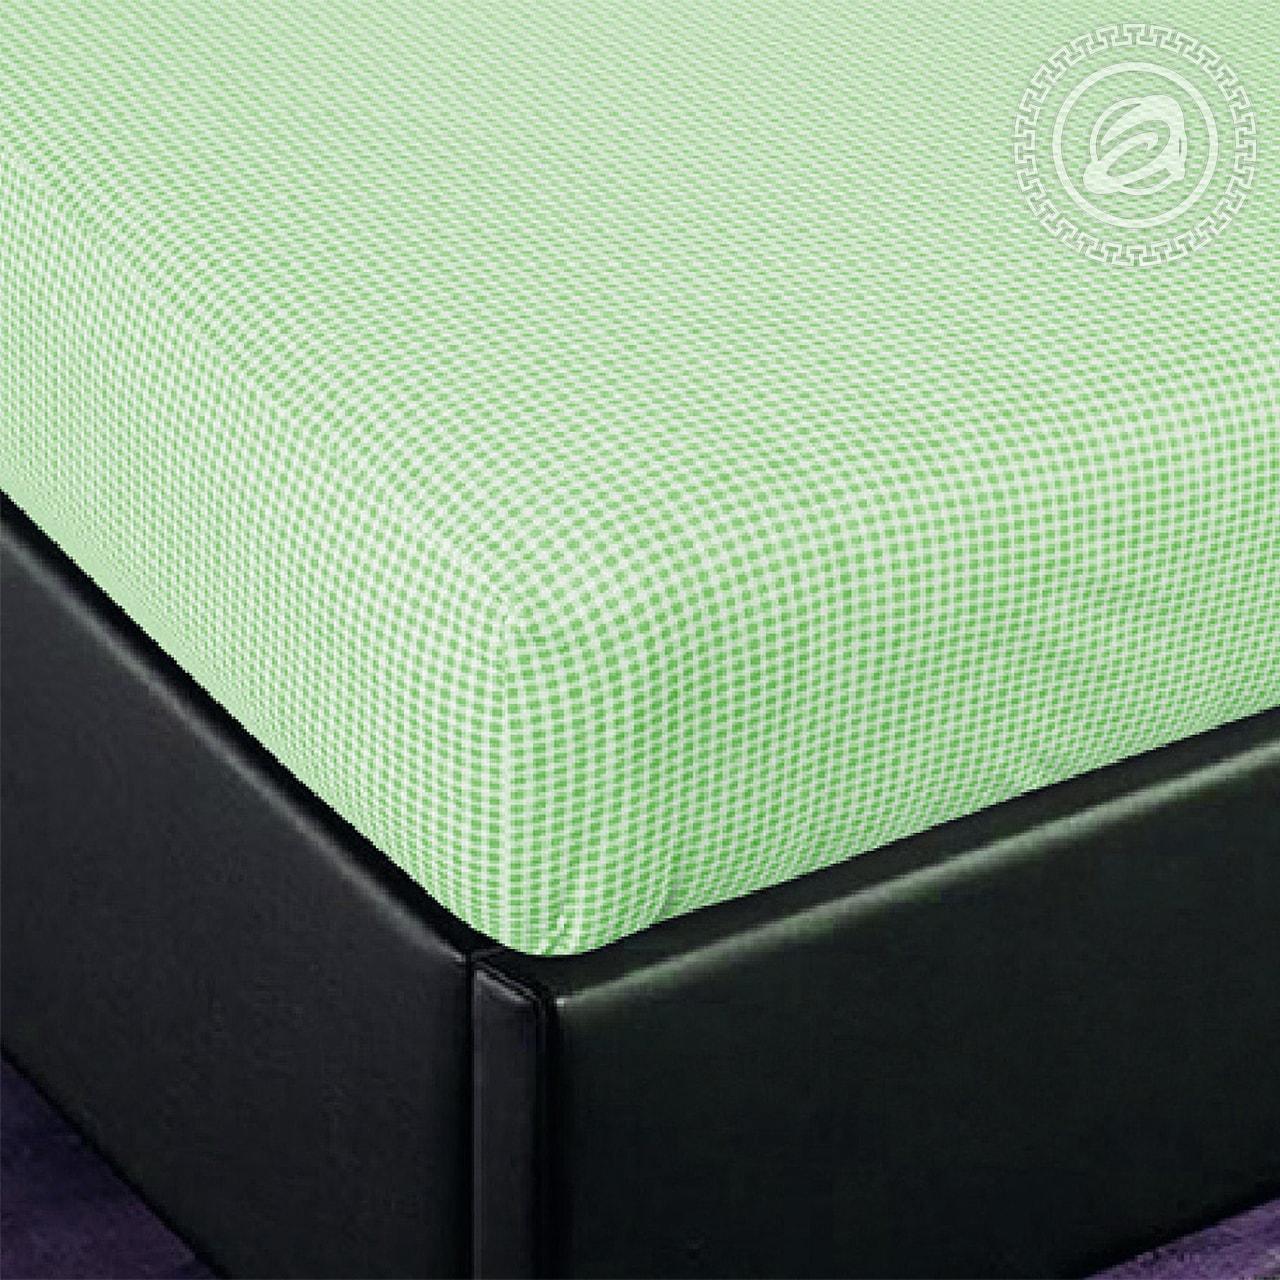 Простыня на резинке iv36273 (трикотаж) 60х120